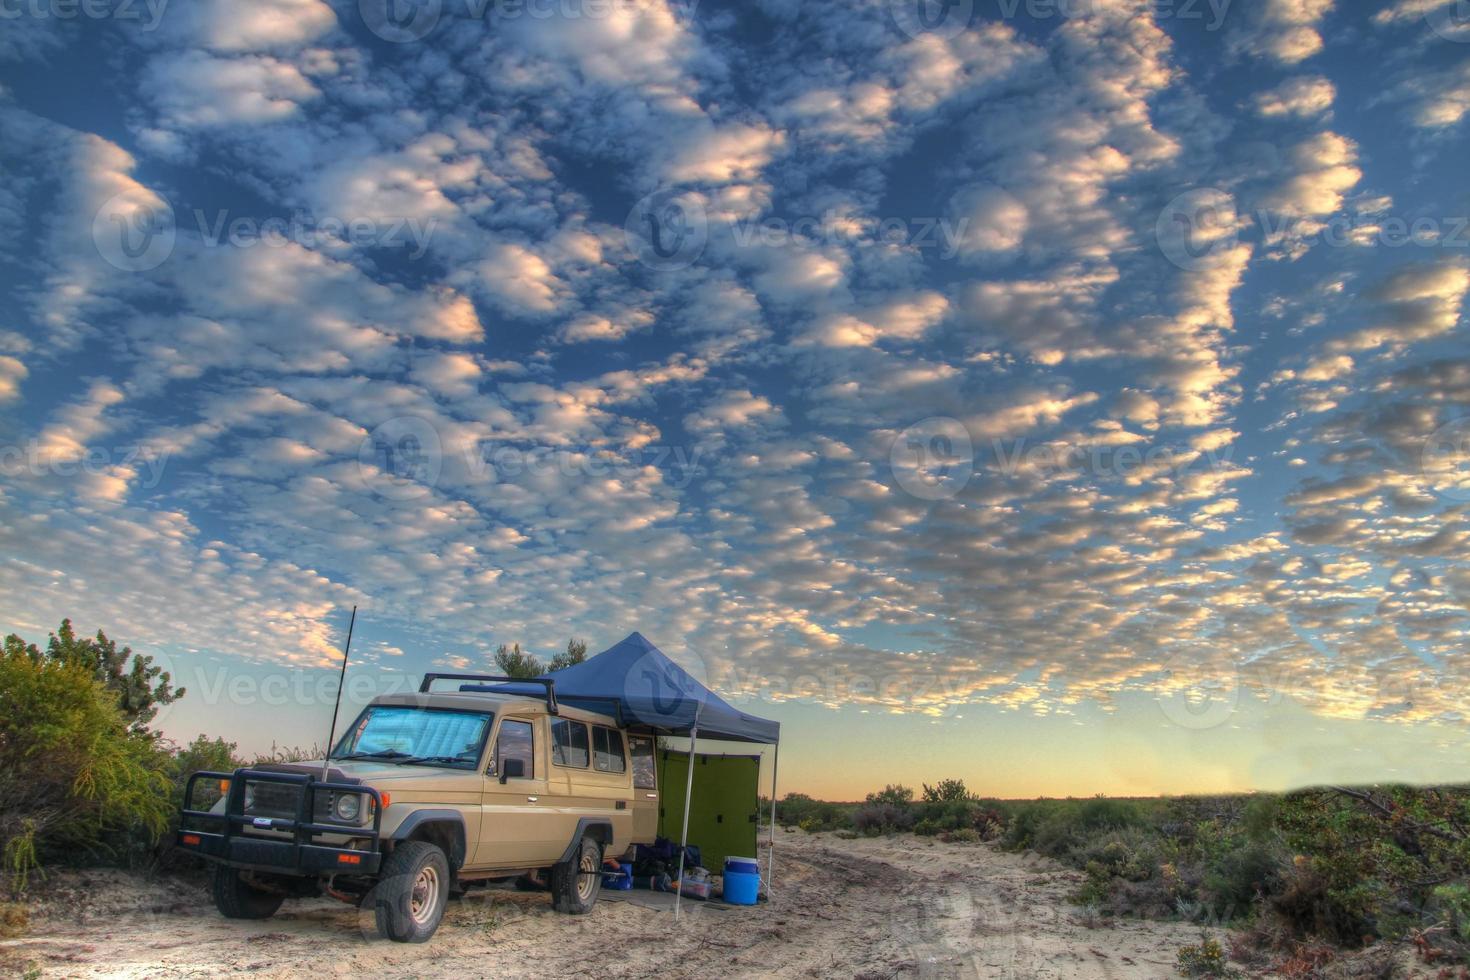 Outback Australia photo